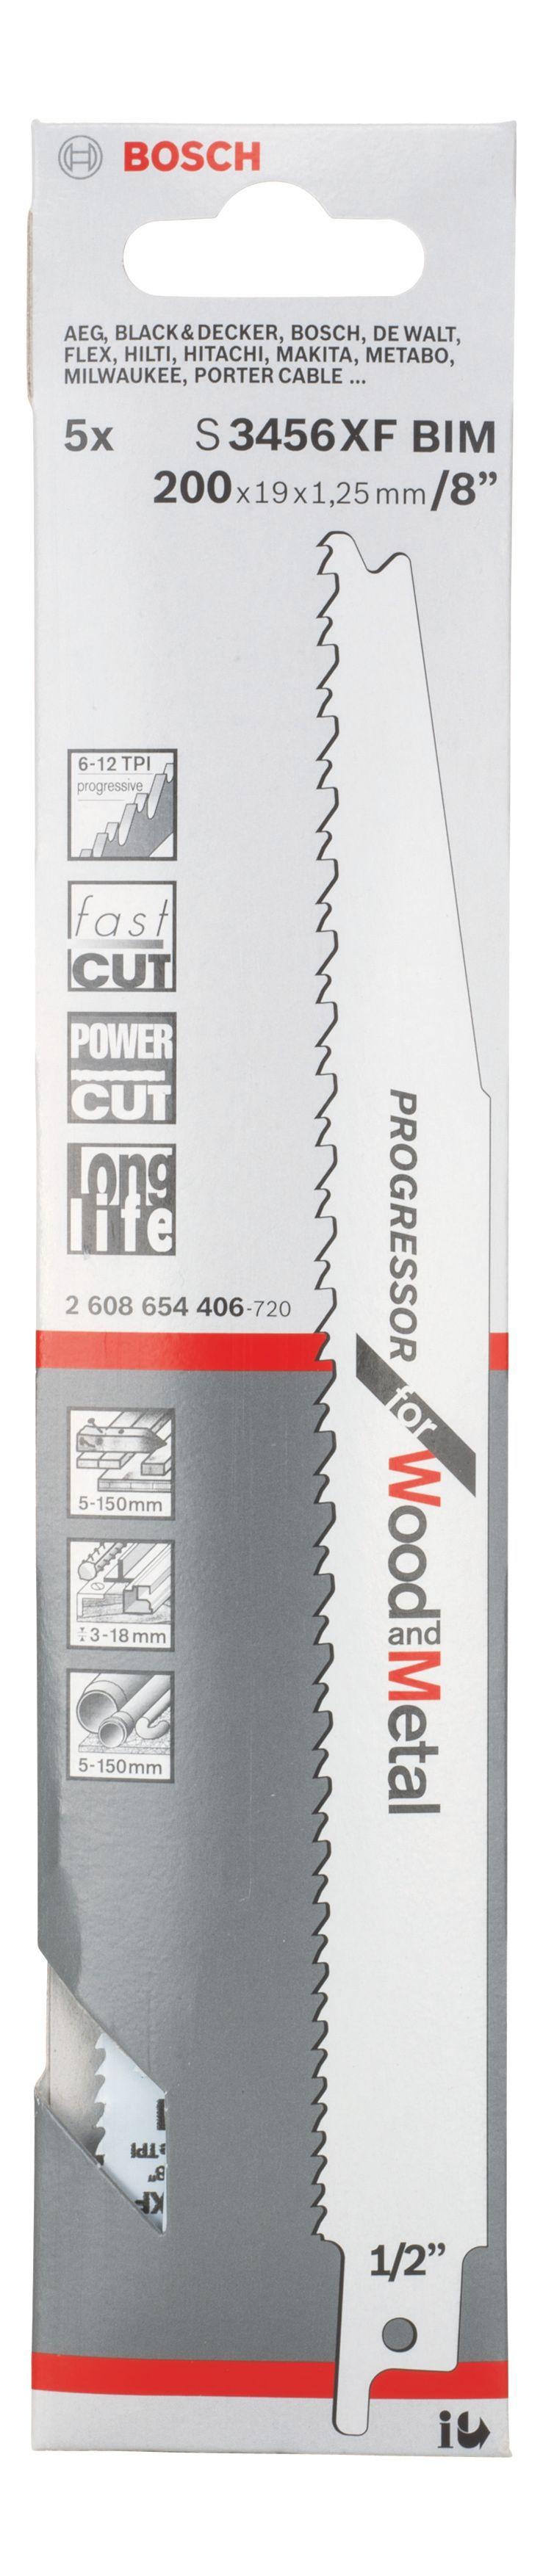 Bosch Sabre Saw Blade (l)200mm, Pack Of 5